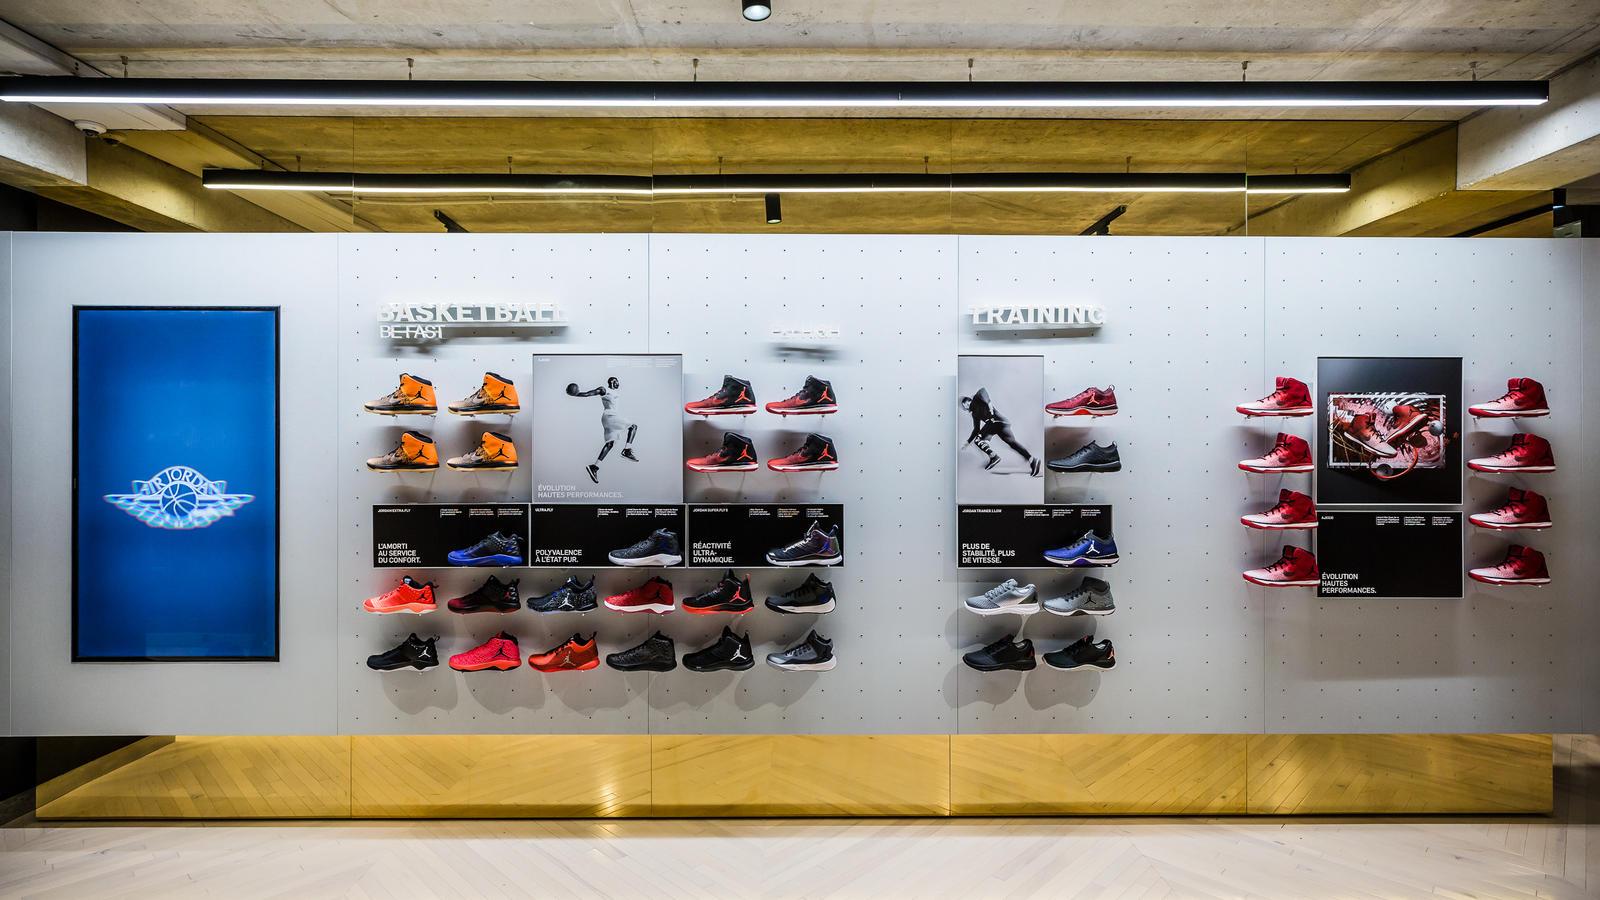 20161121-Nike-Jordan-Bastille-Opening-70 9f75bae83